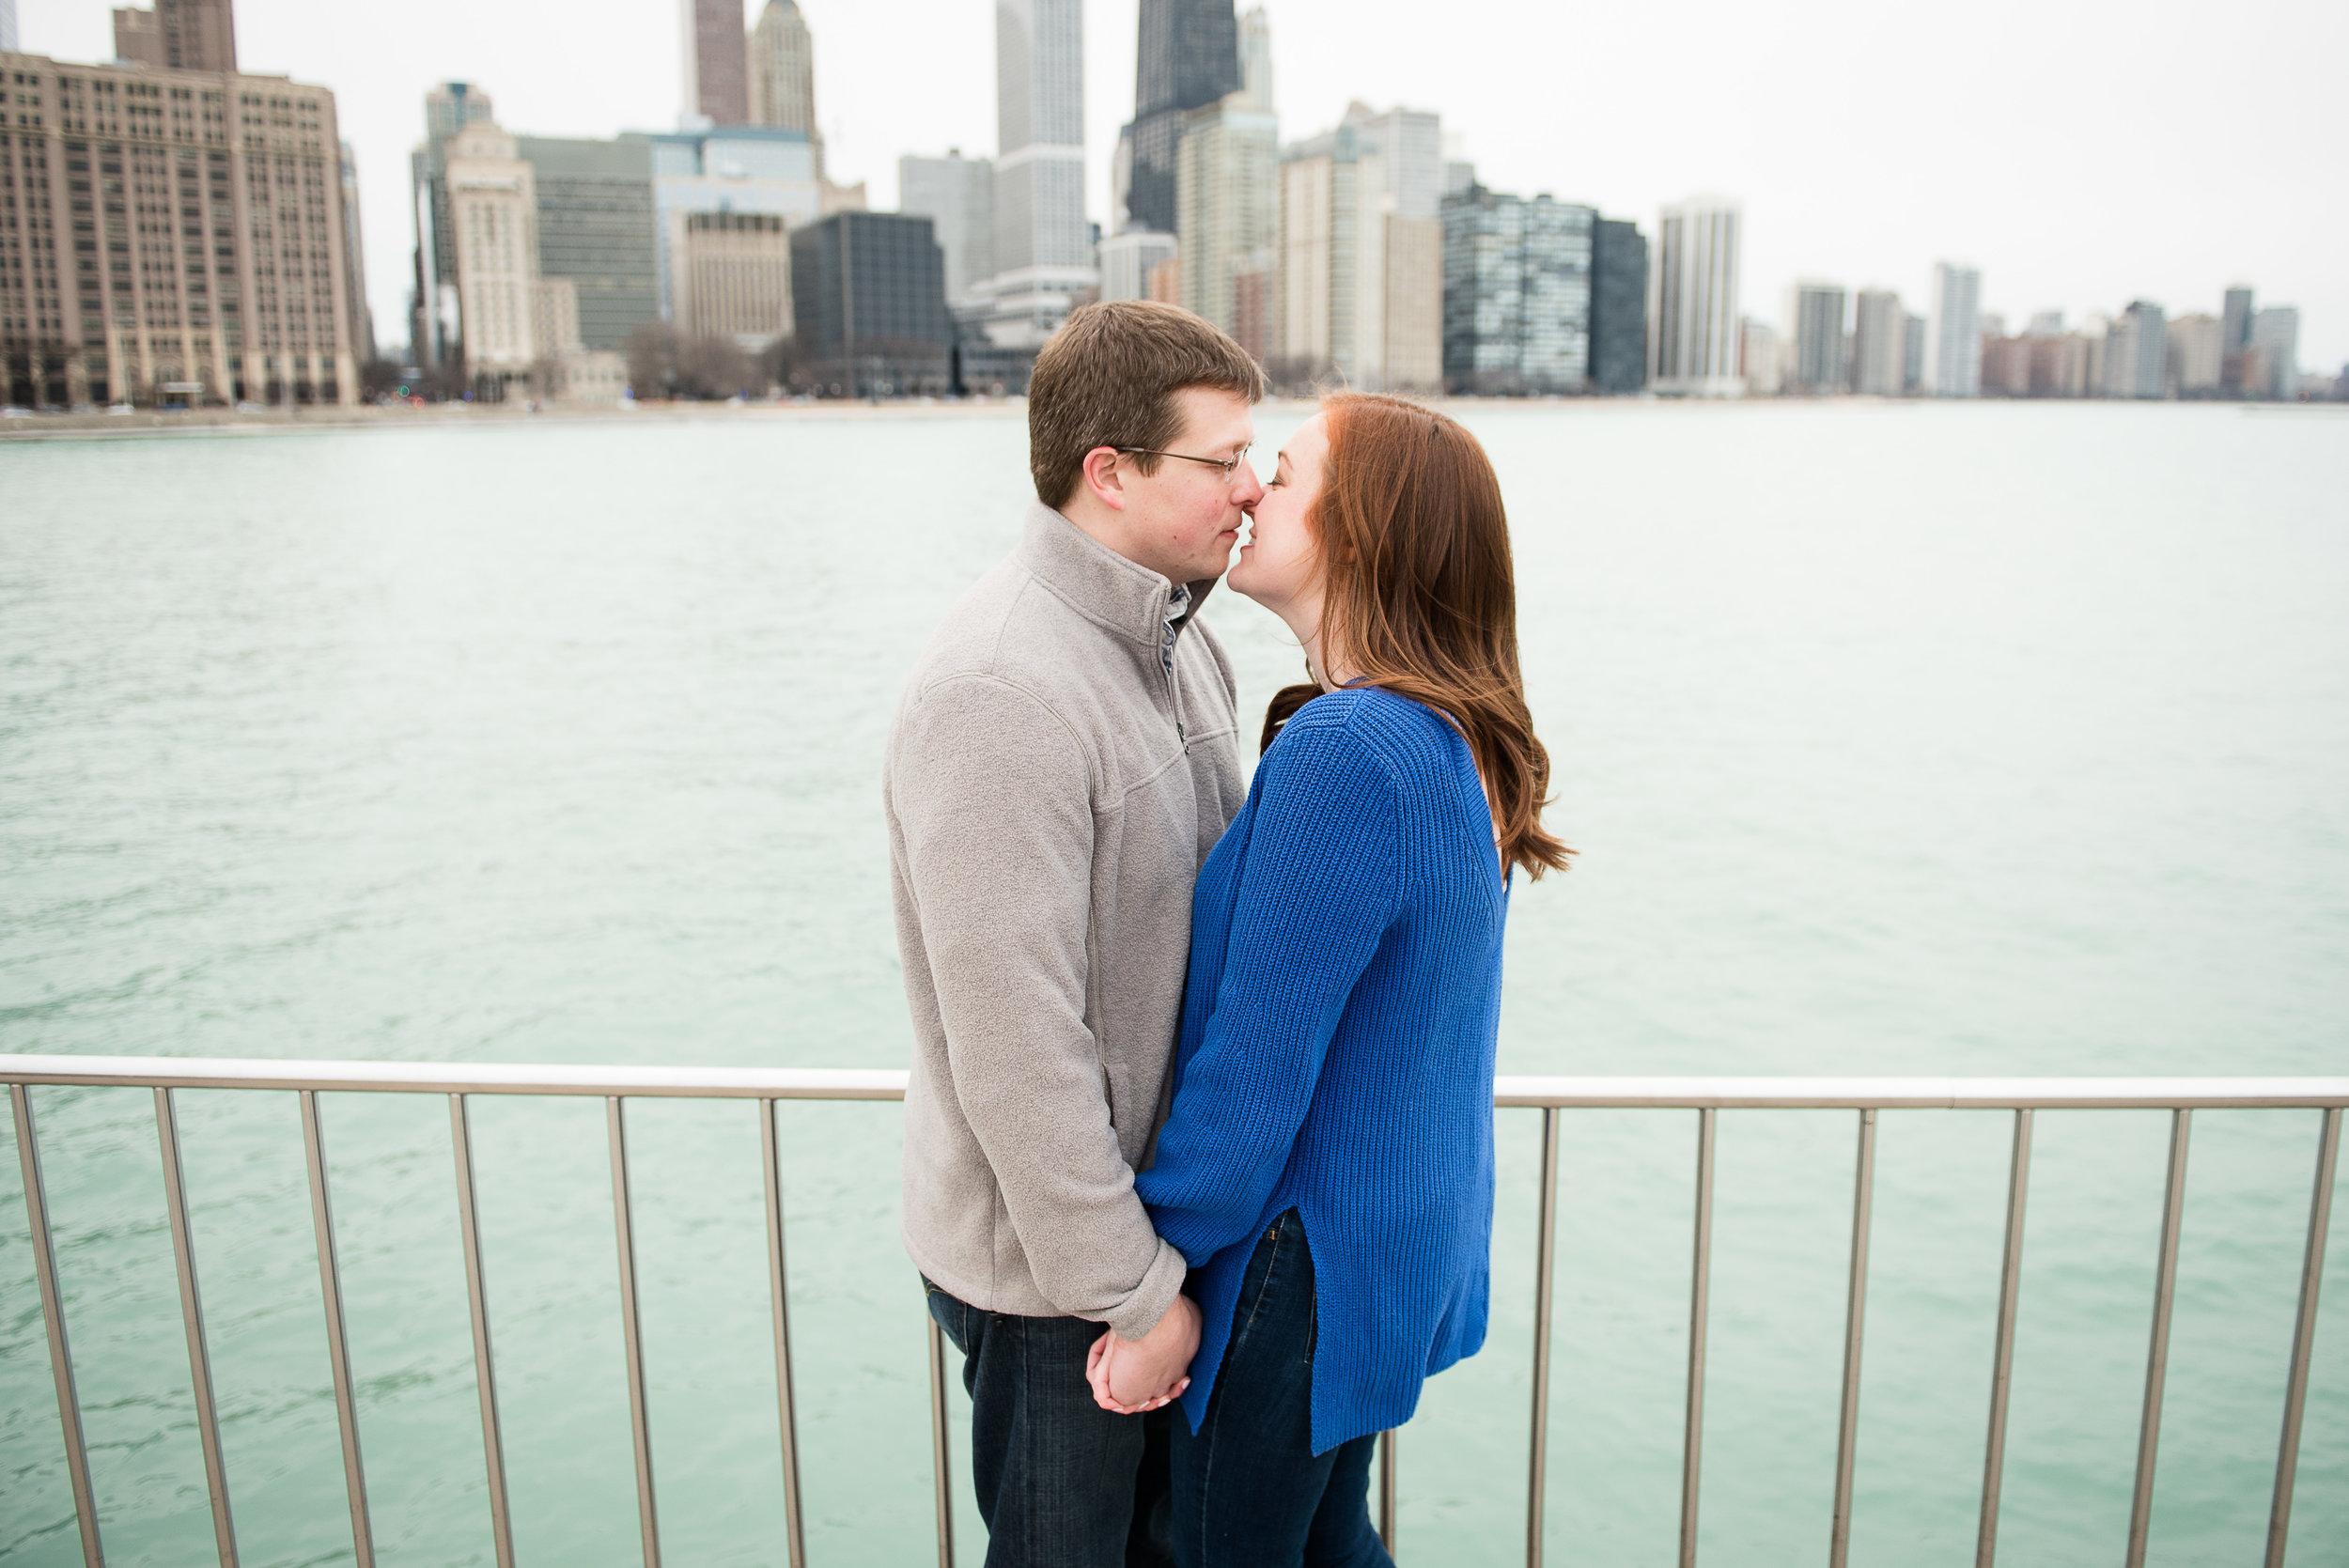 chicago-engagement-photography-metts-photo-7.jpg